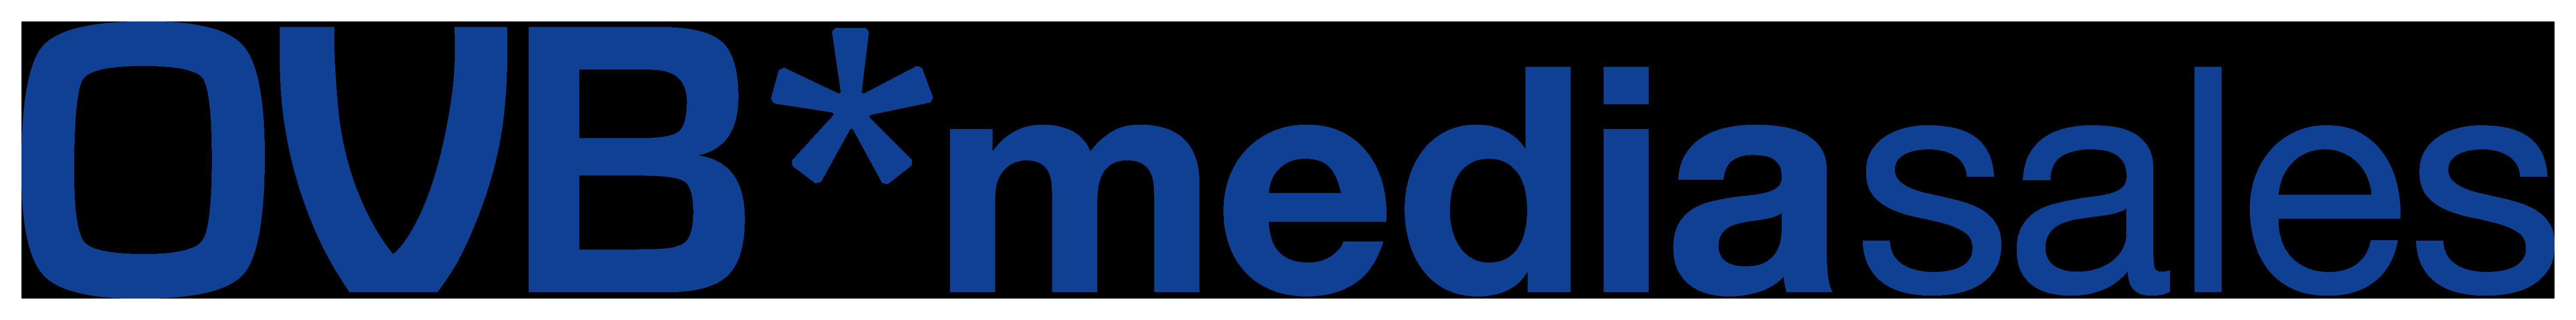 OVB Mediasales Logo Retina